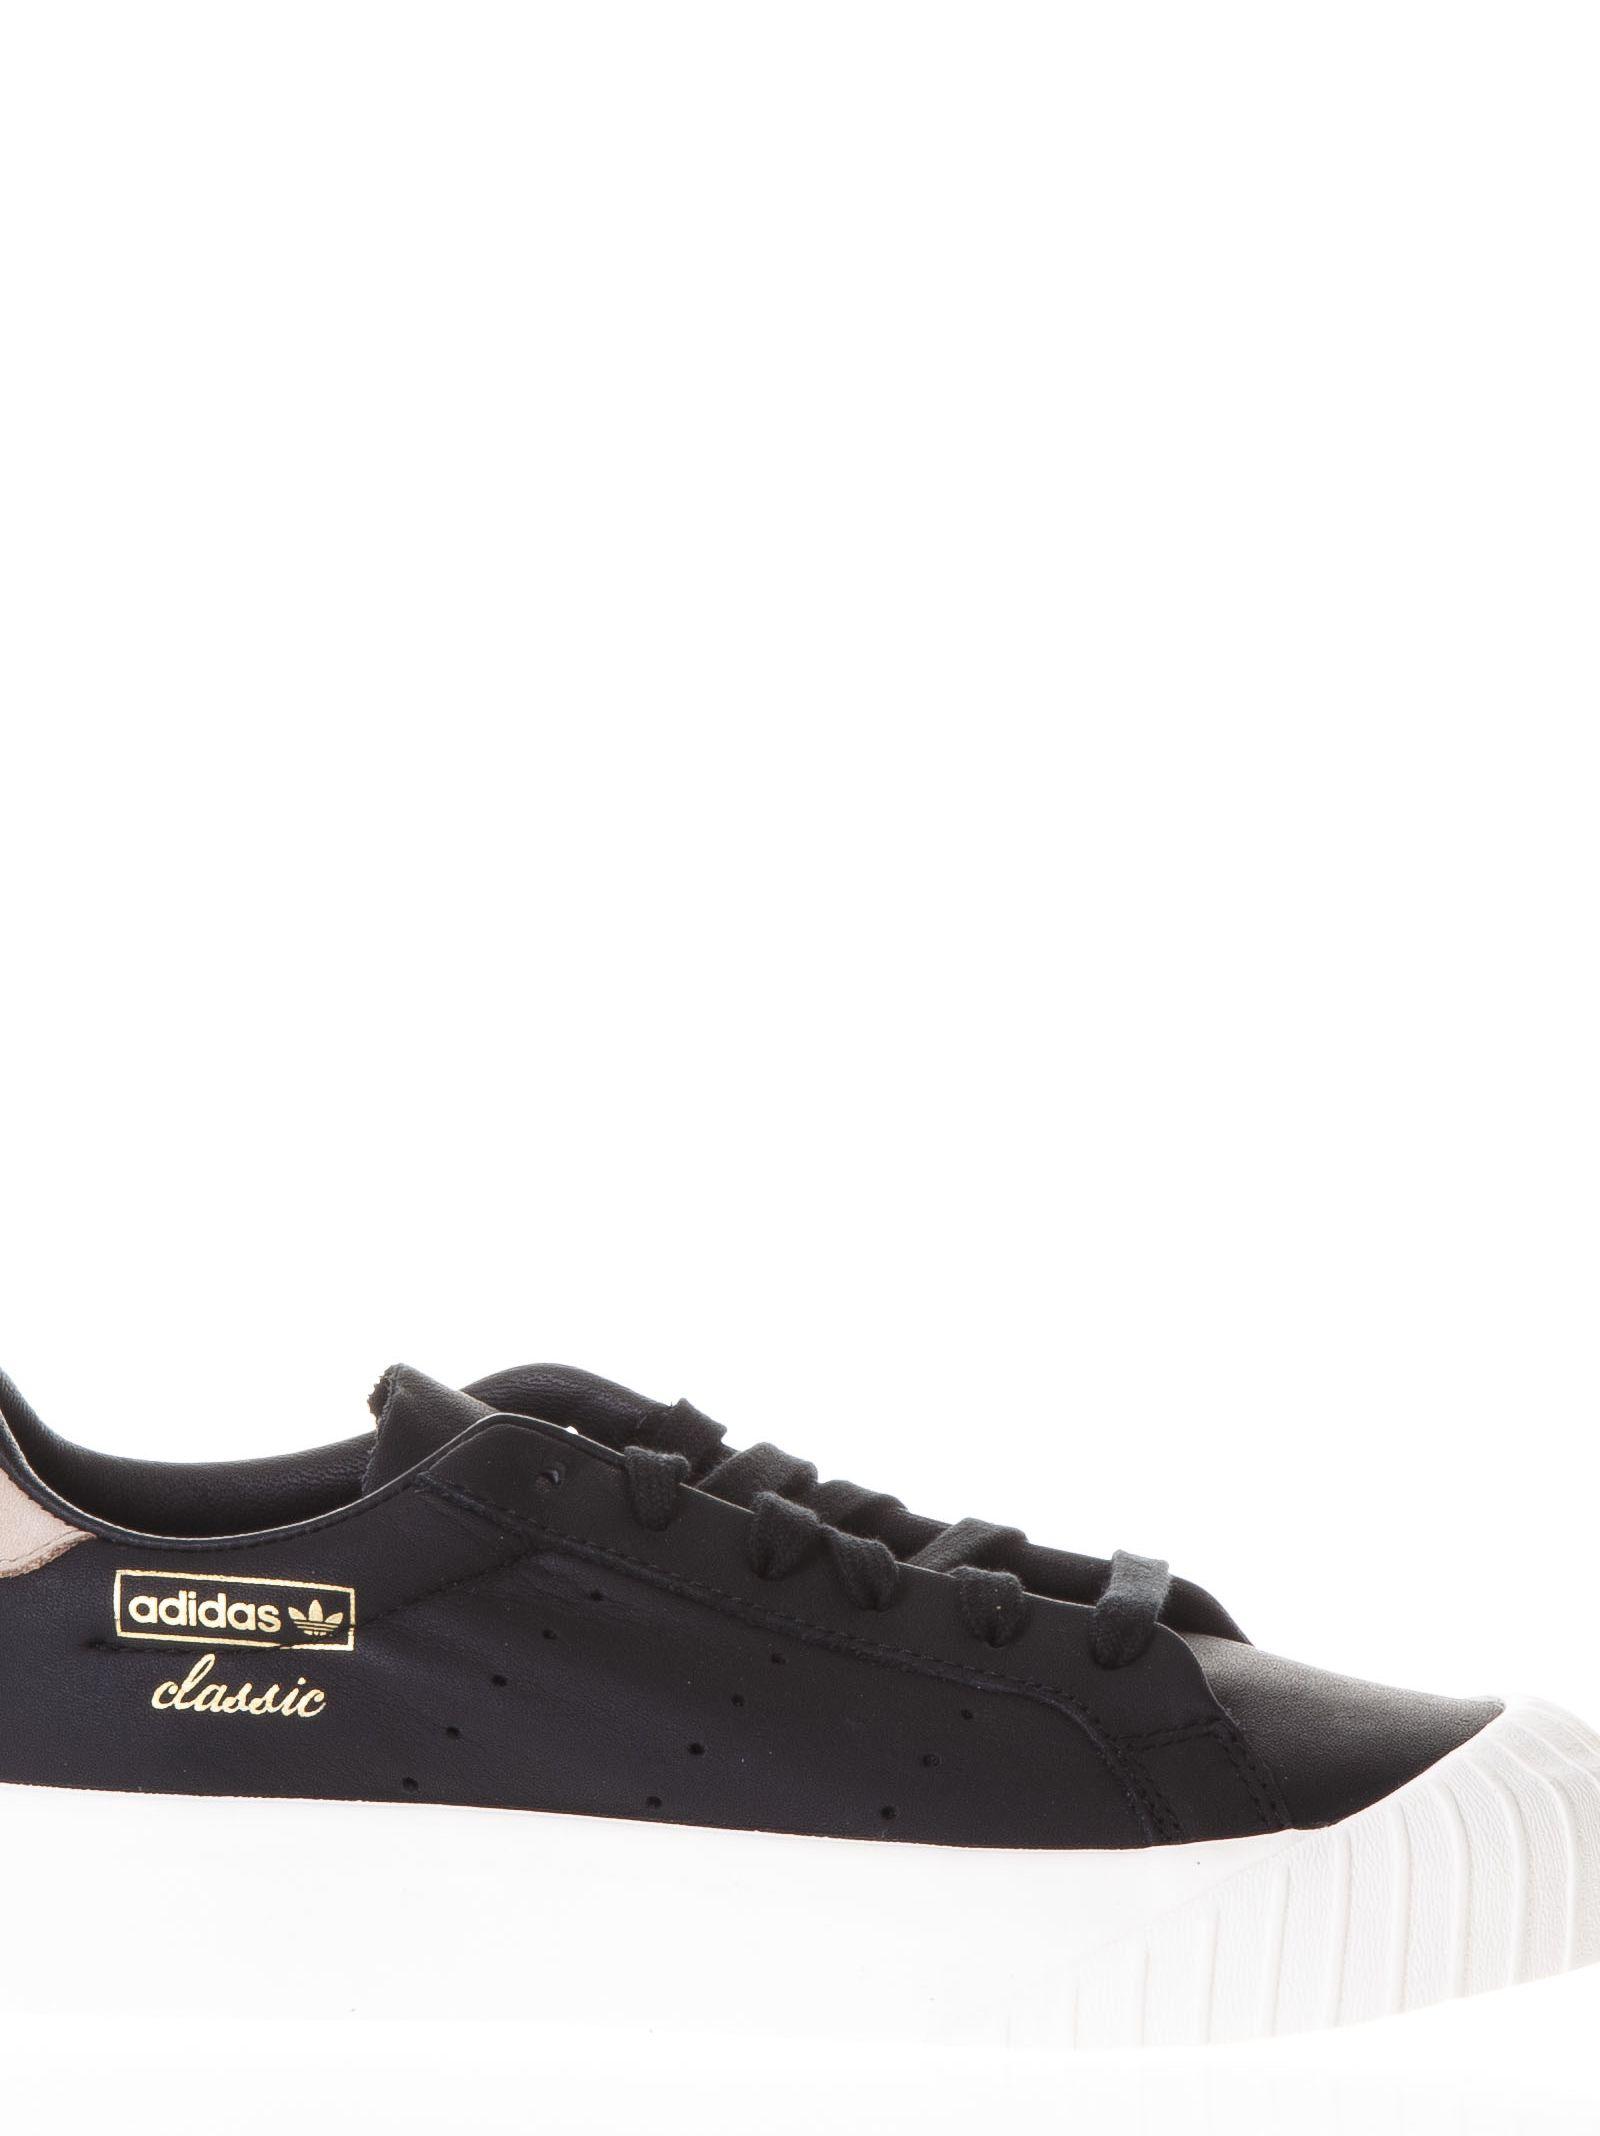 Adidas Originals Black Everyn Sneakers In Leather